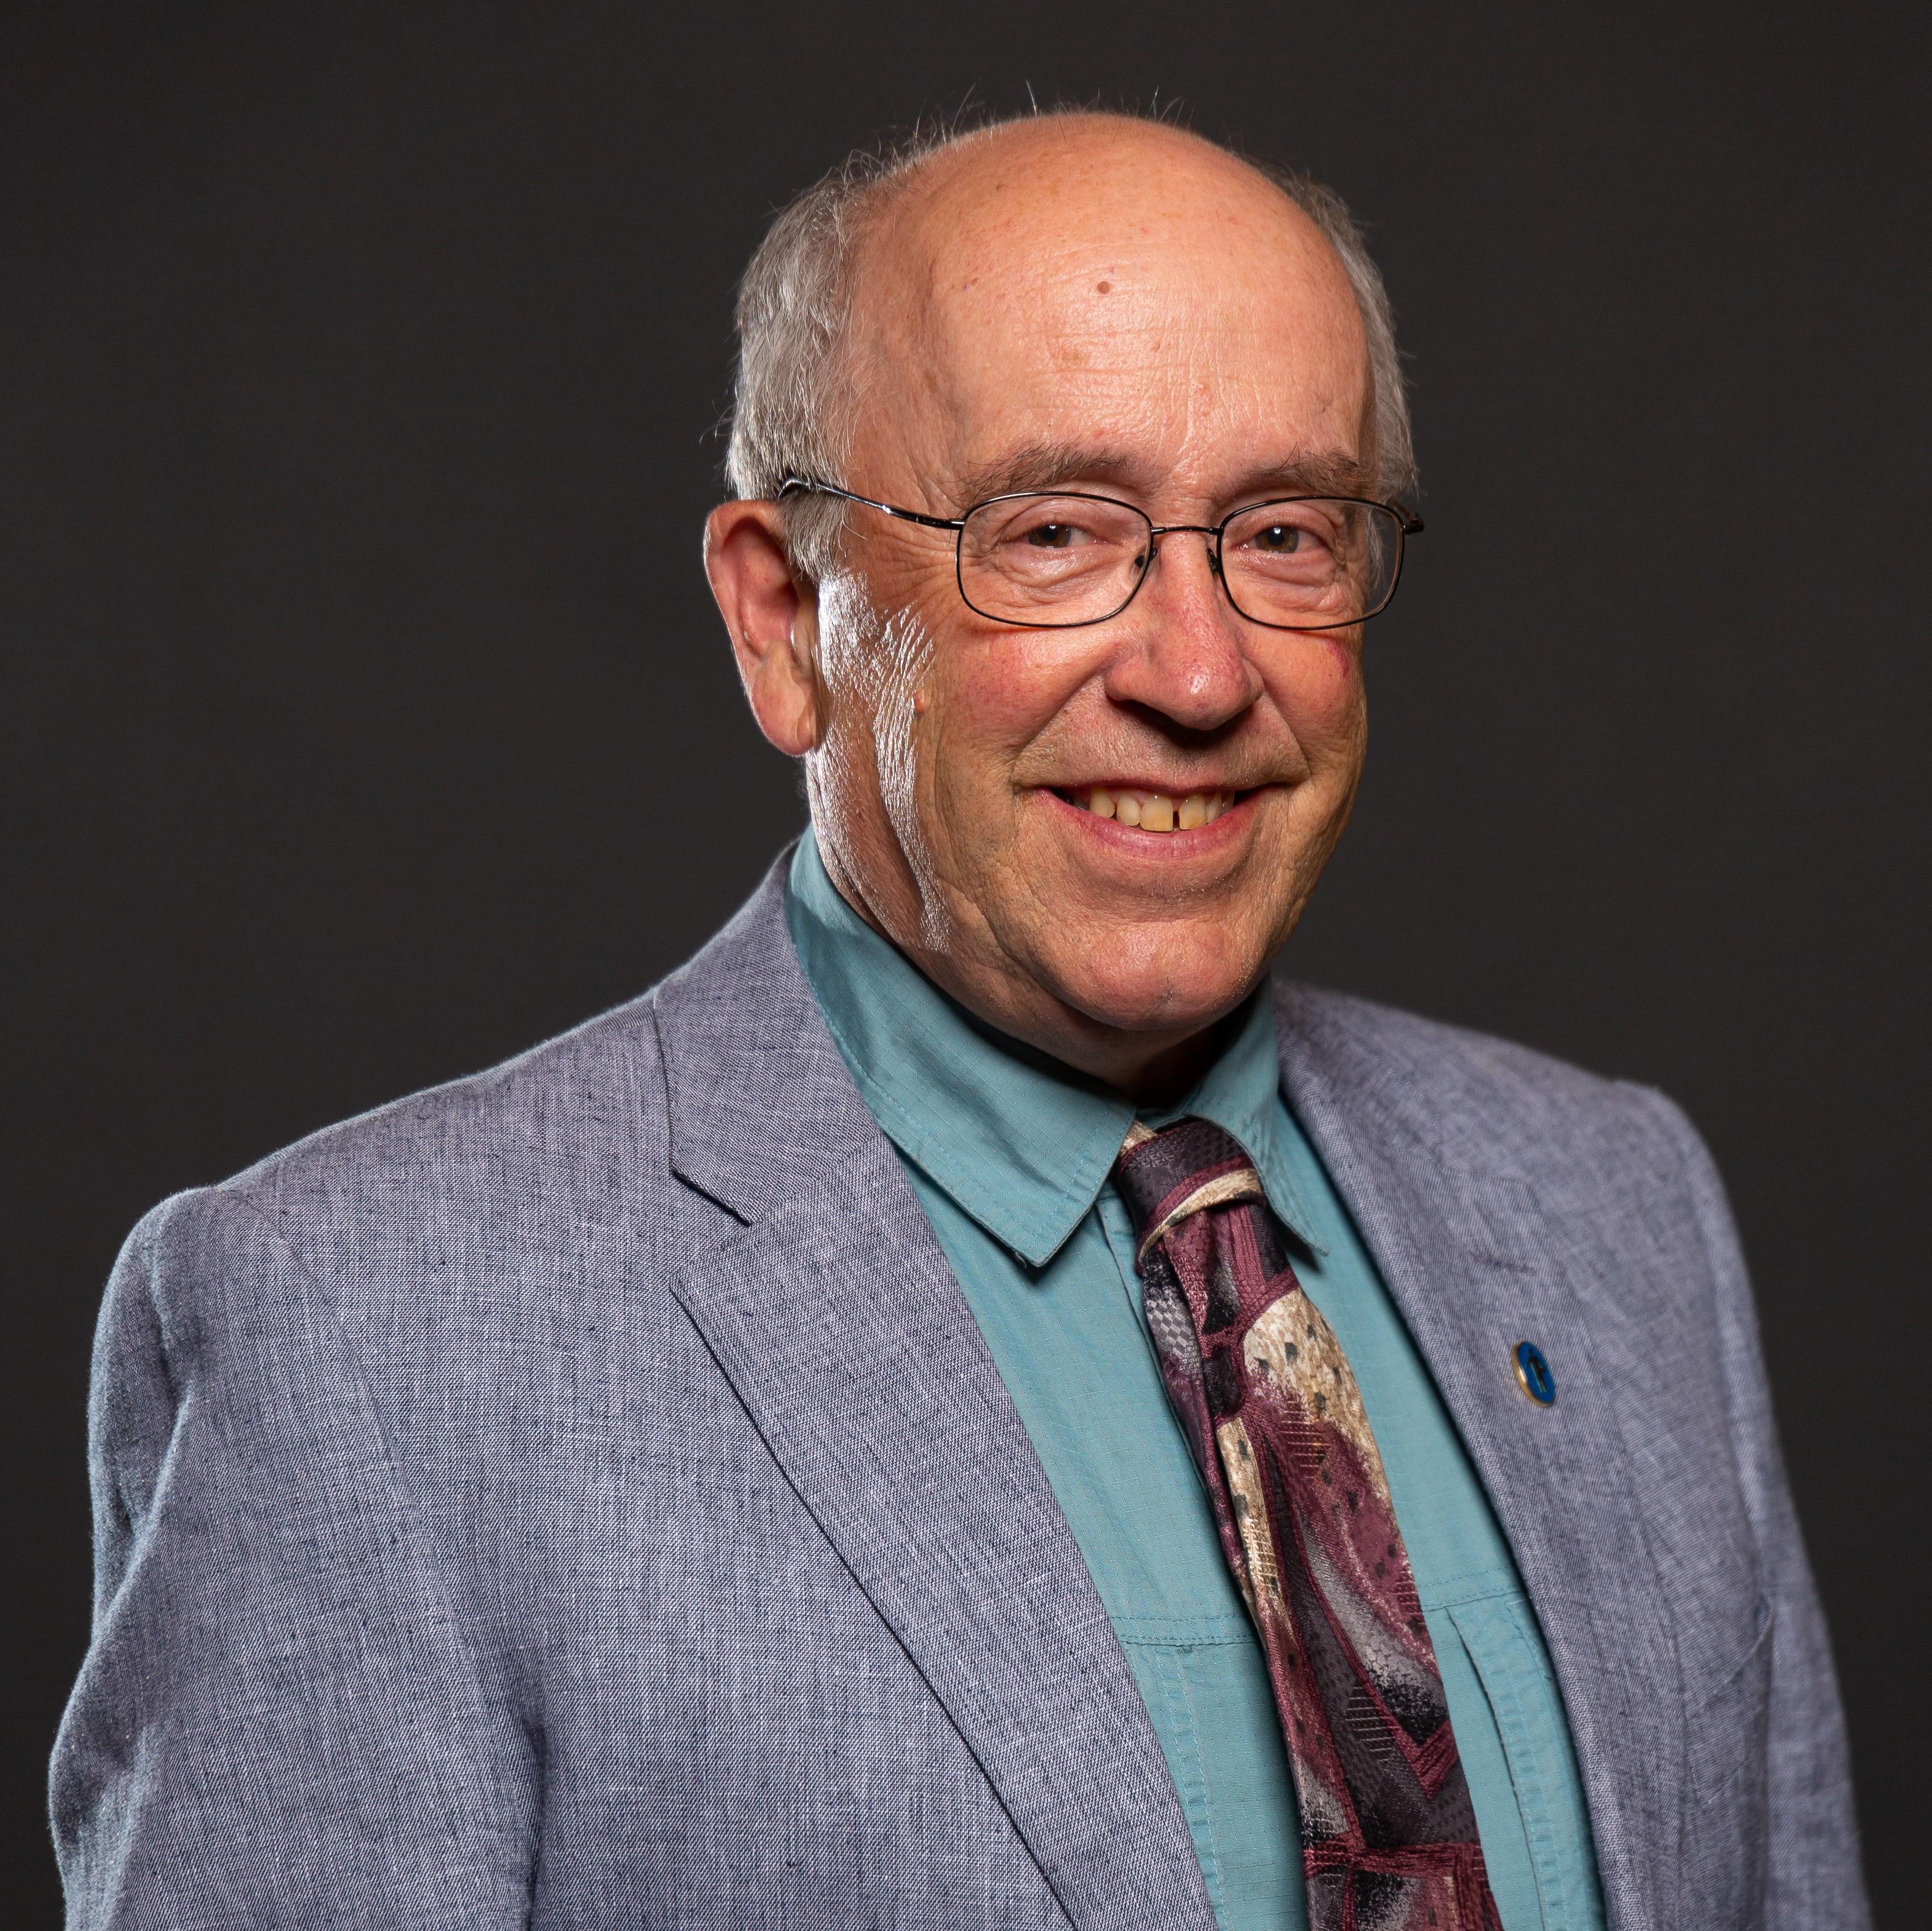 Jim Baillie